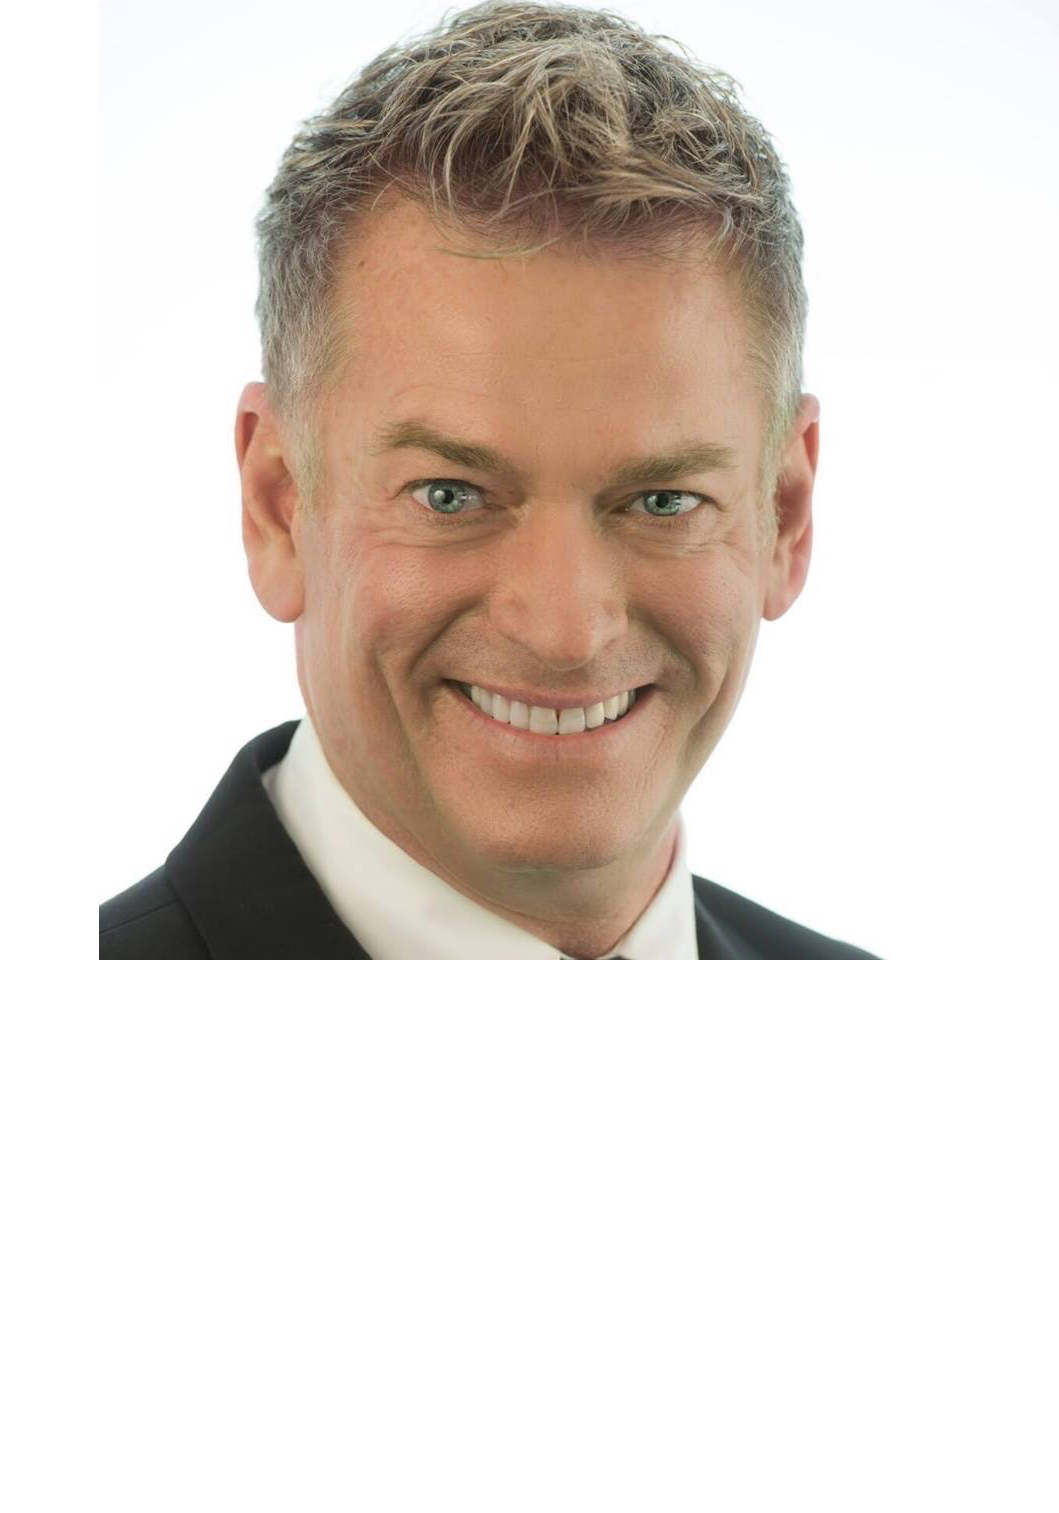 Craig Hutcheson